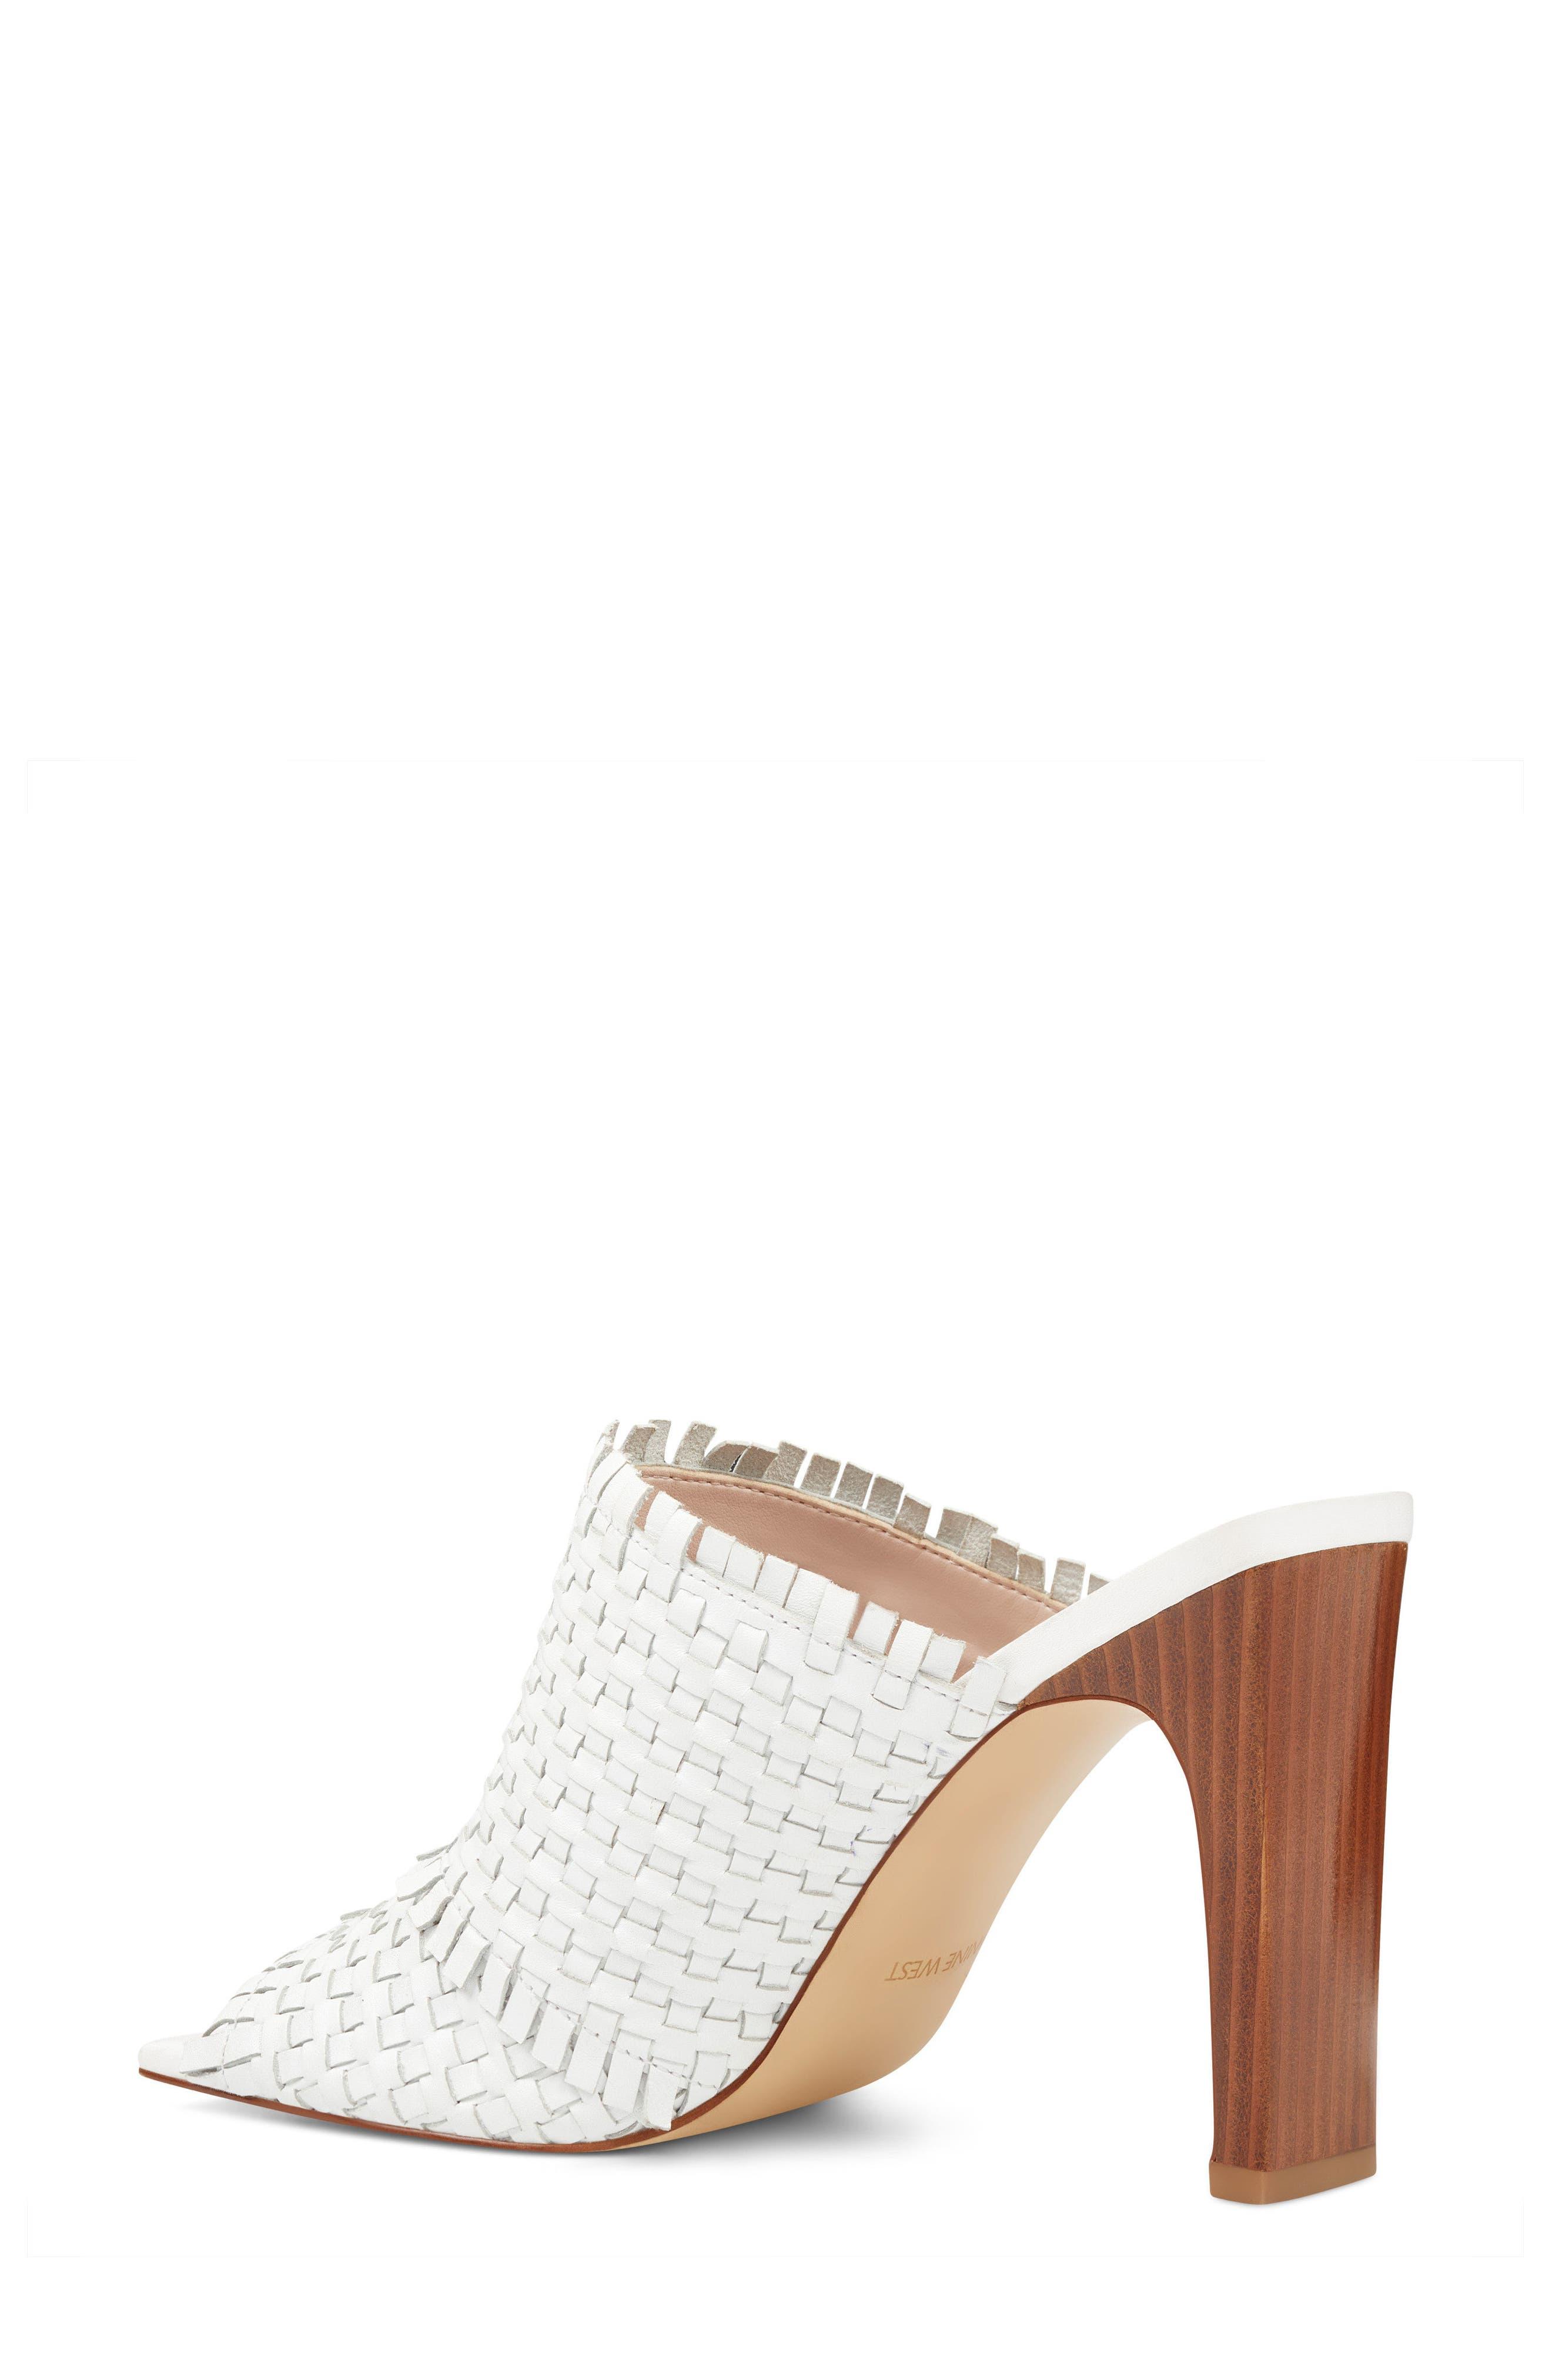 Lucili Woven Mule,                             Alternate thumbnail 2, color,                             White Leather